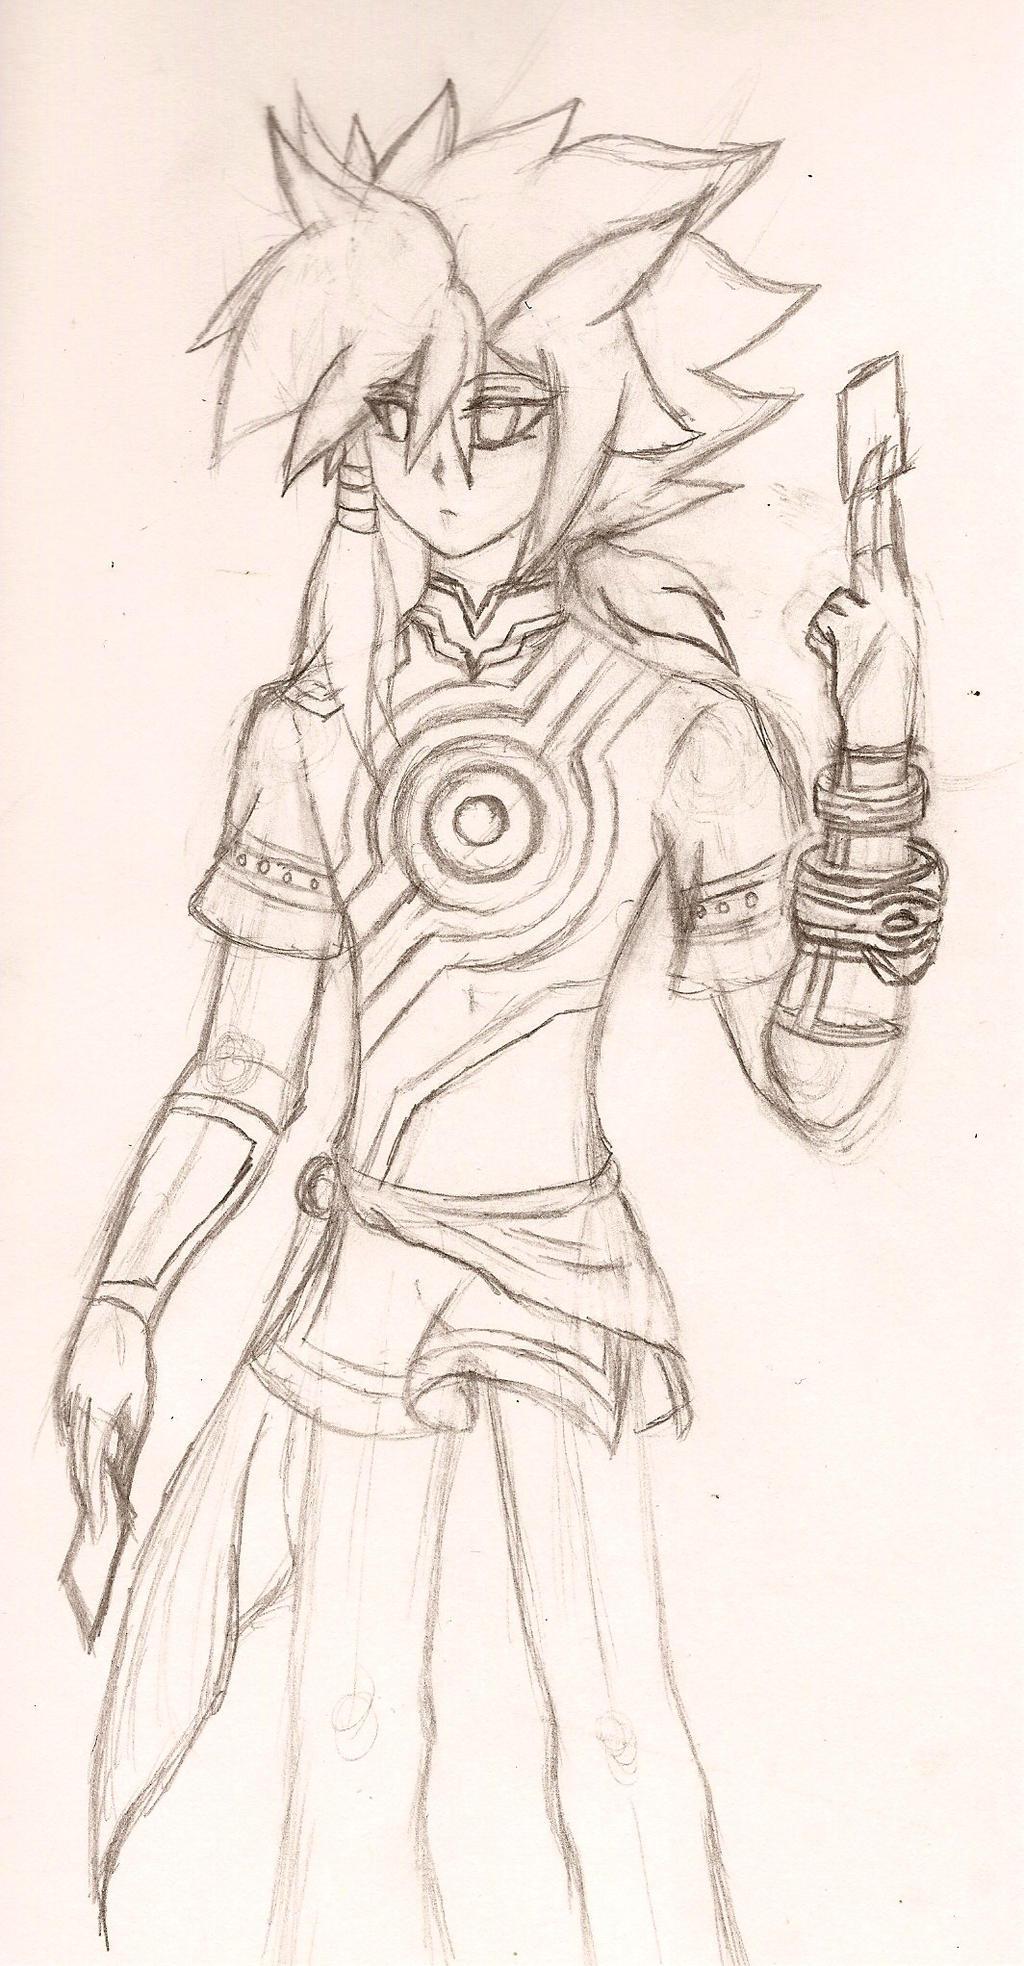 Yugioh Oc: Yasuhiro Tsuneo (Sketch) by NeonNeoz